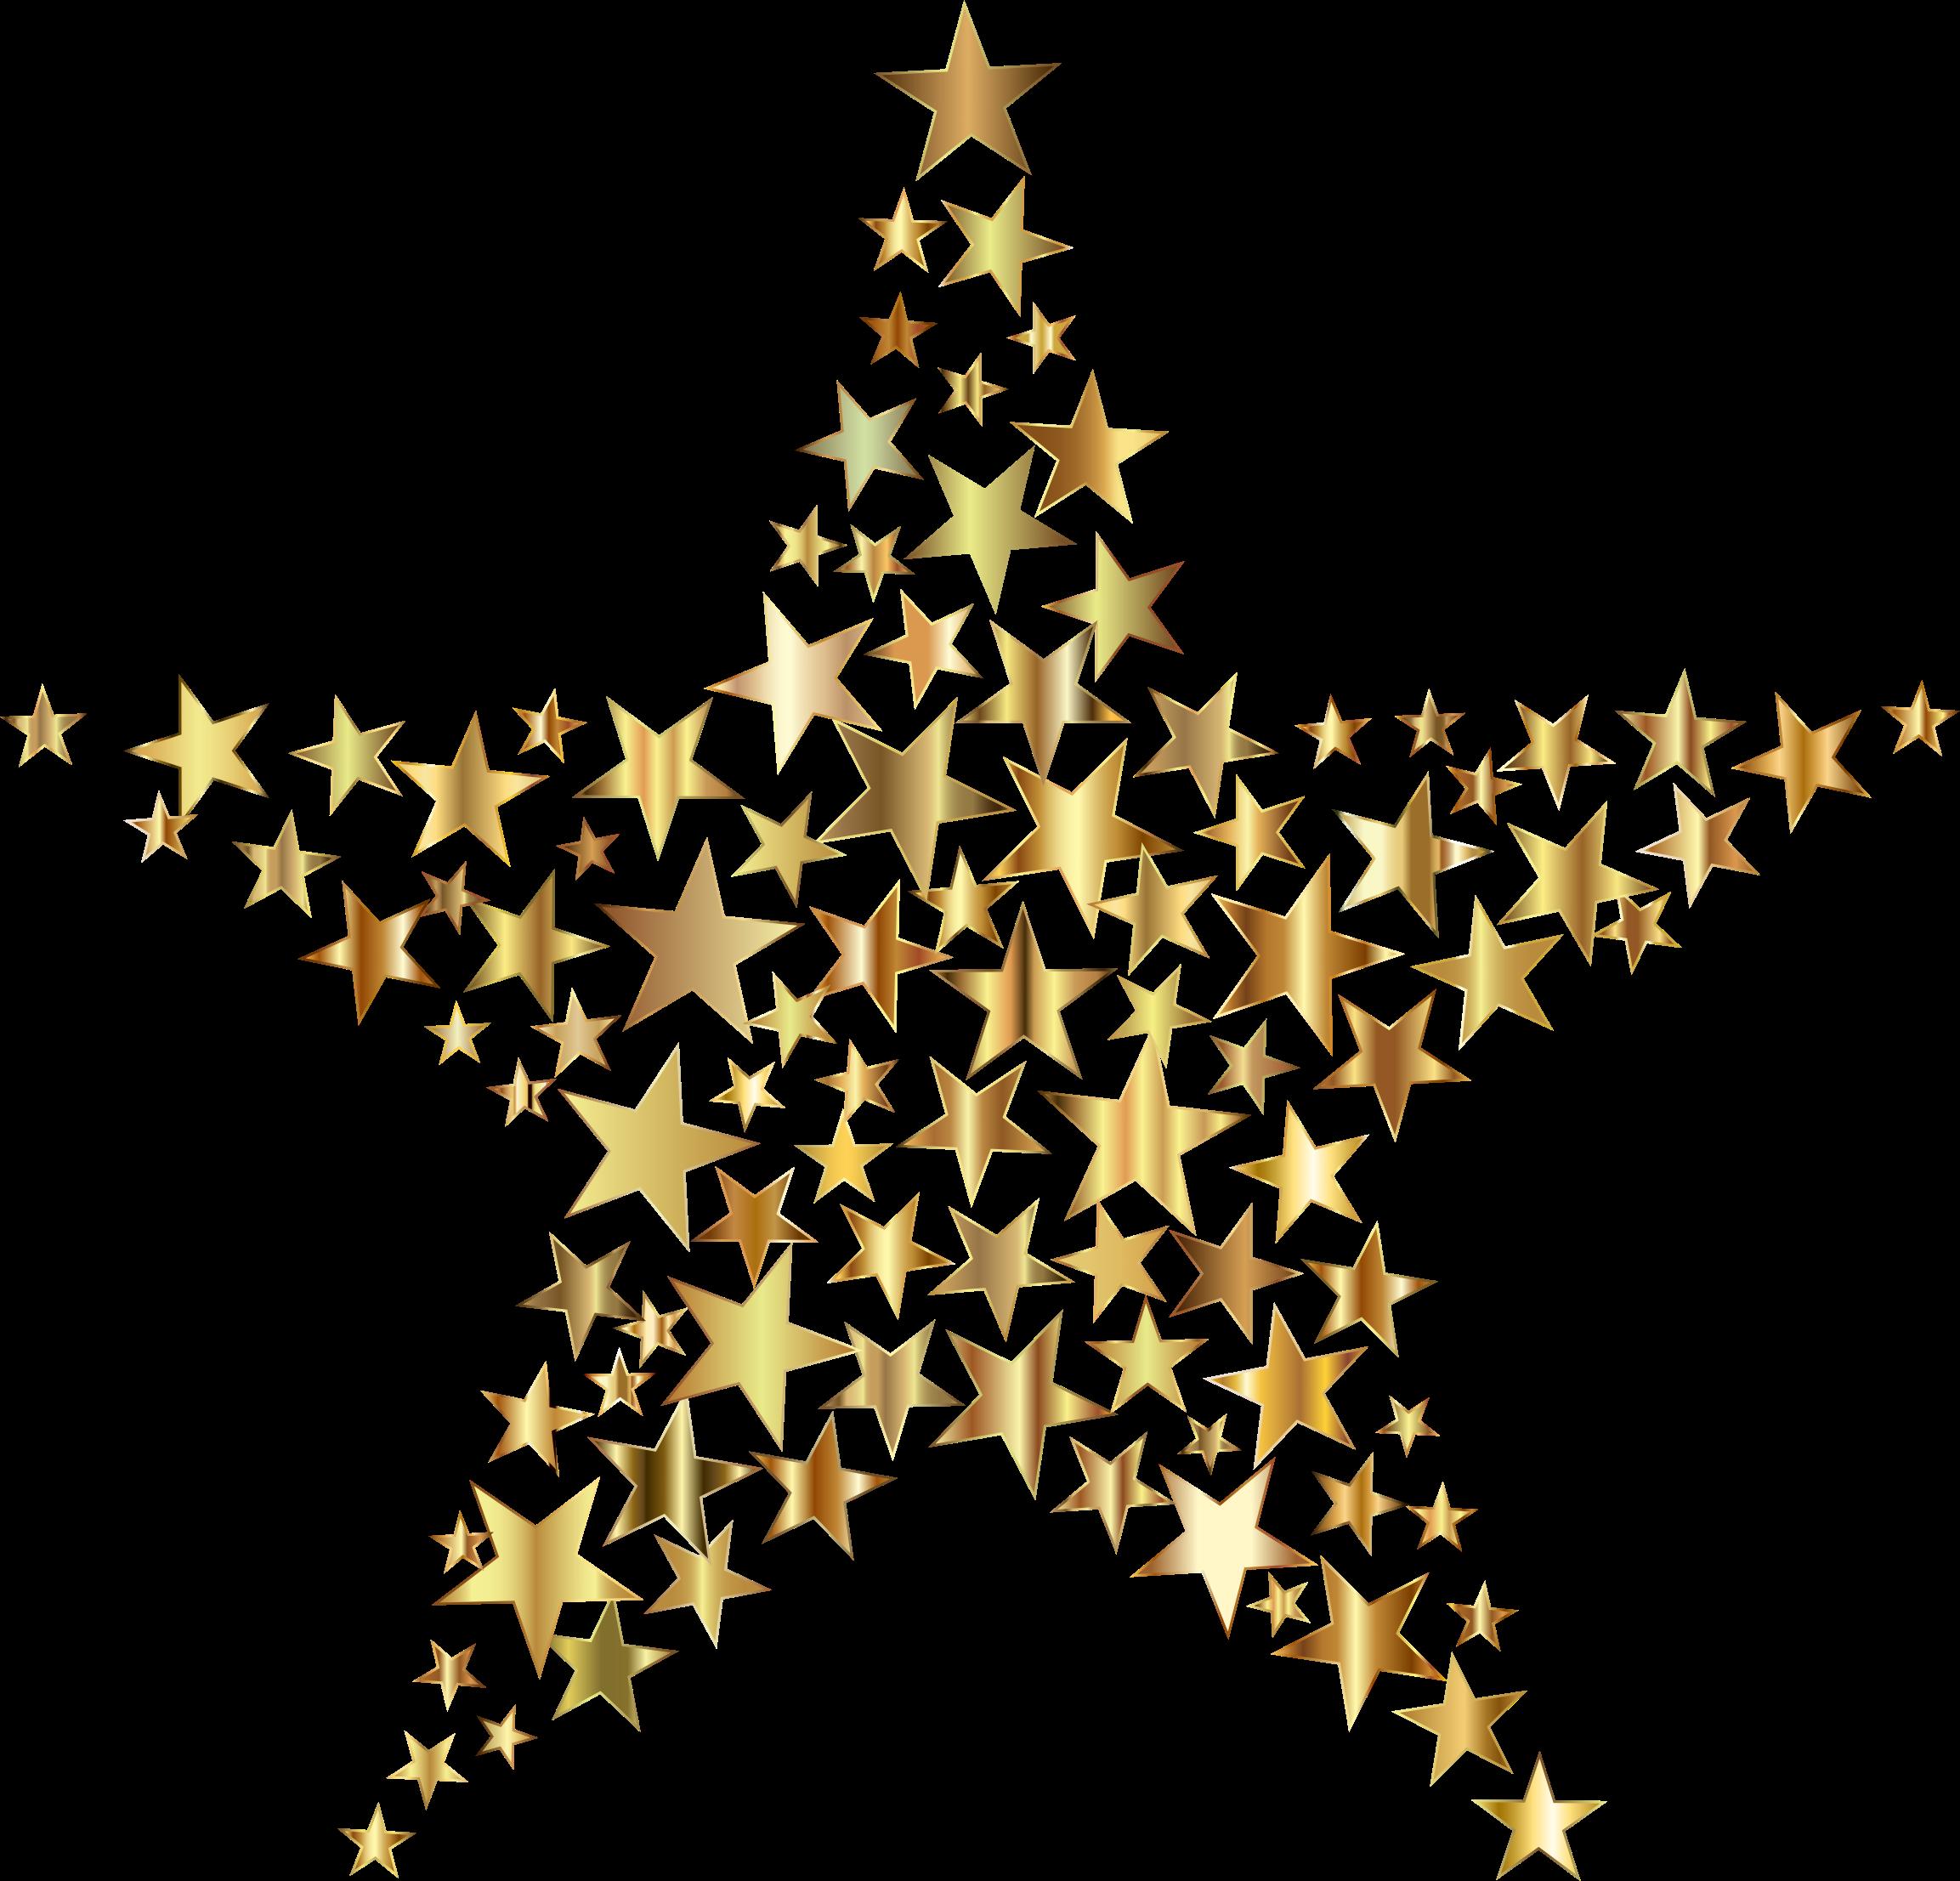 Gold Star Fractal No Background by GDJ Fractals, Star